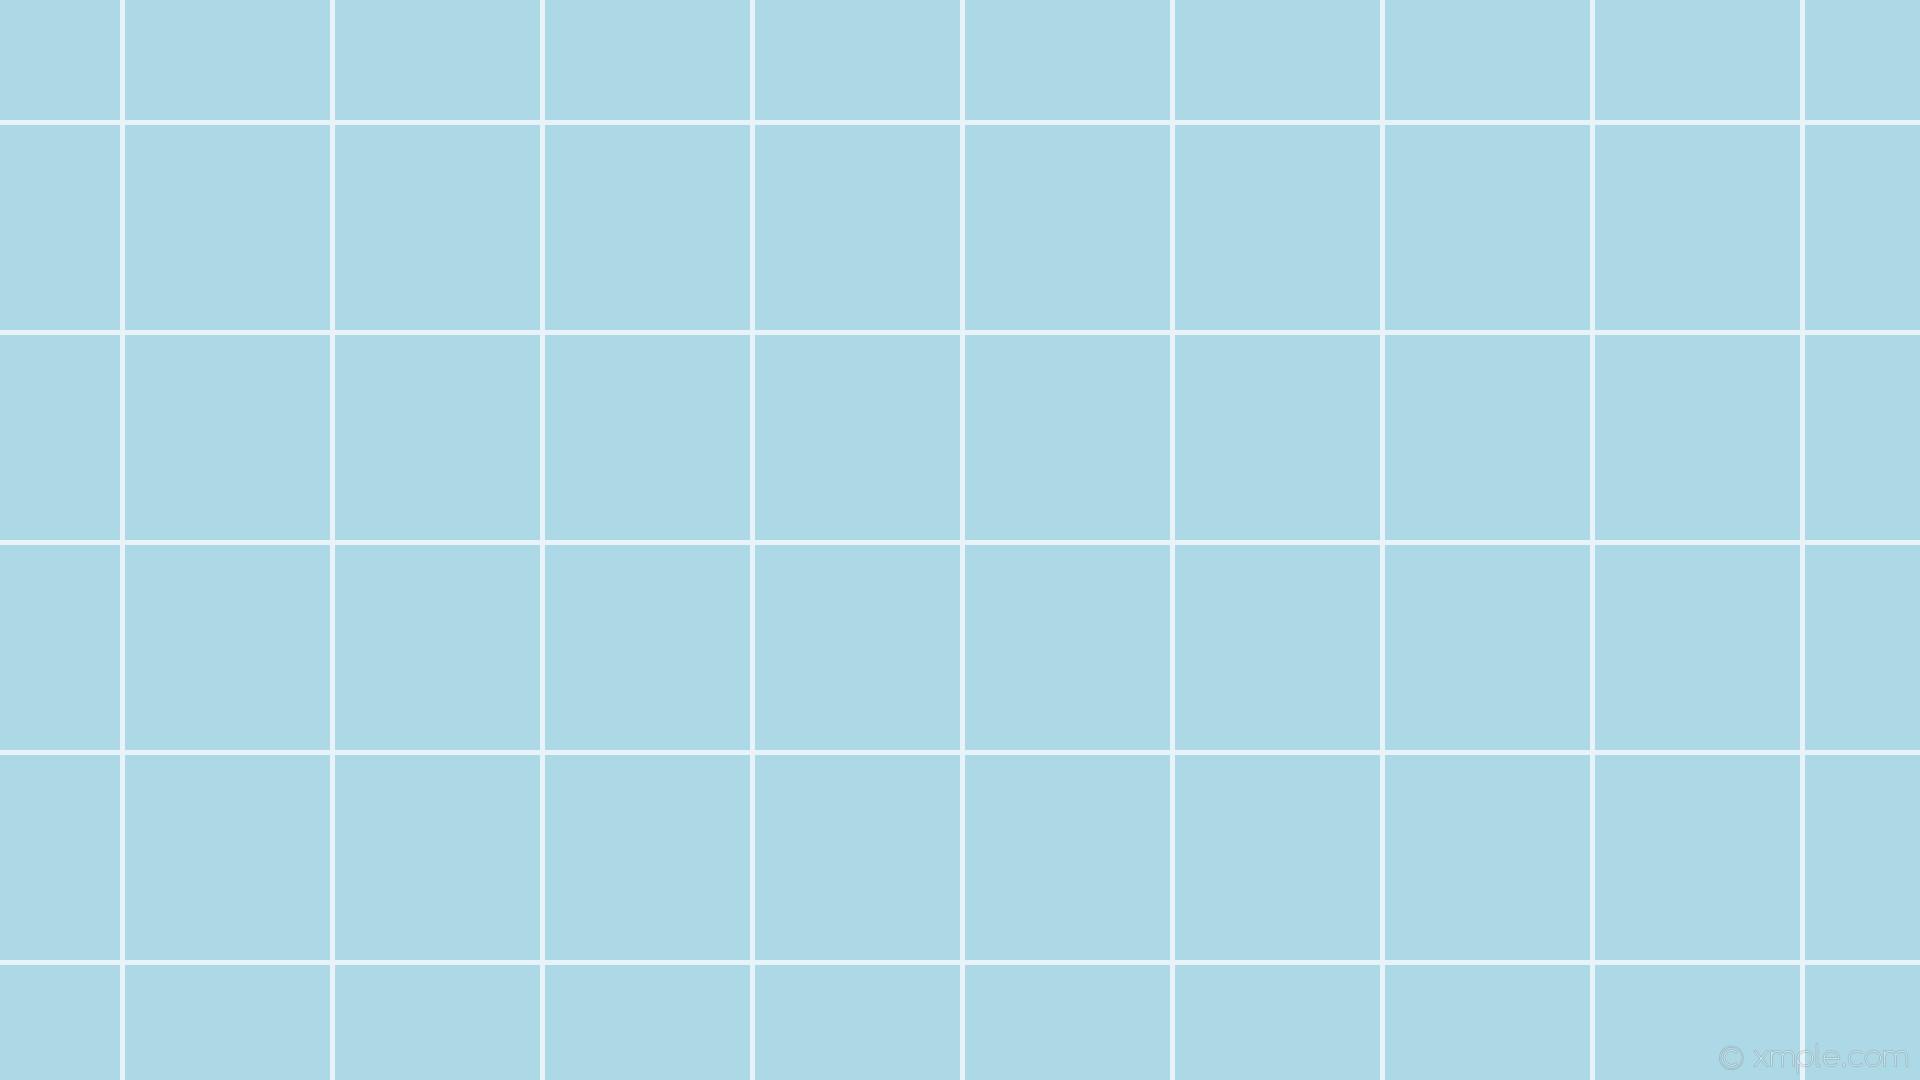 1920x1080 Wallpaper White Graph Paper Blue Grid Light Add8e6 Ffffff 0A 5px